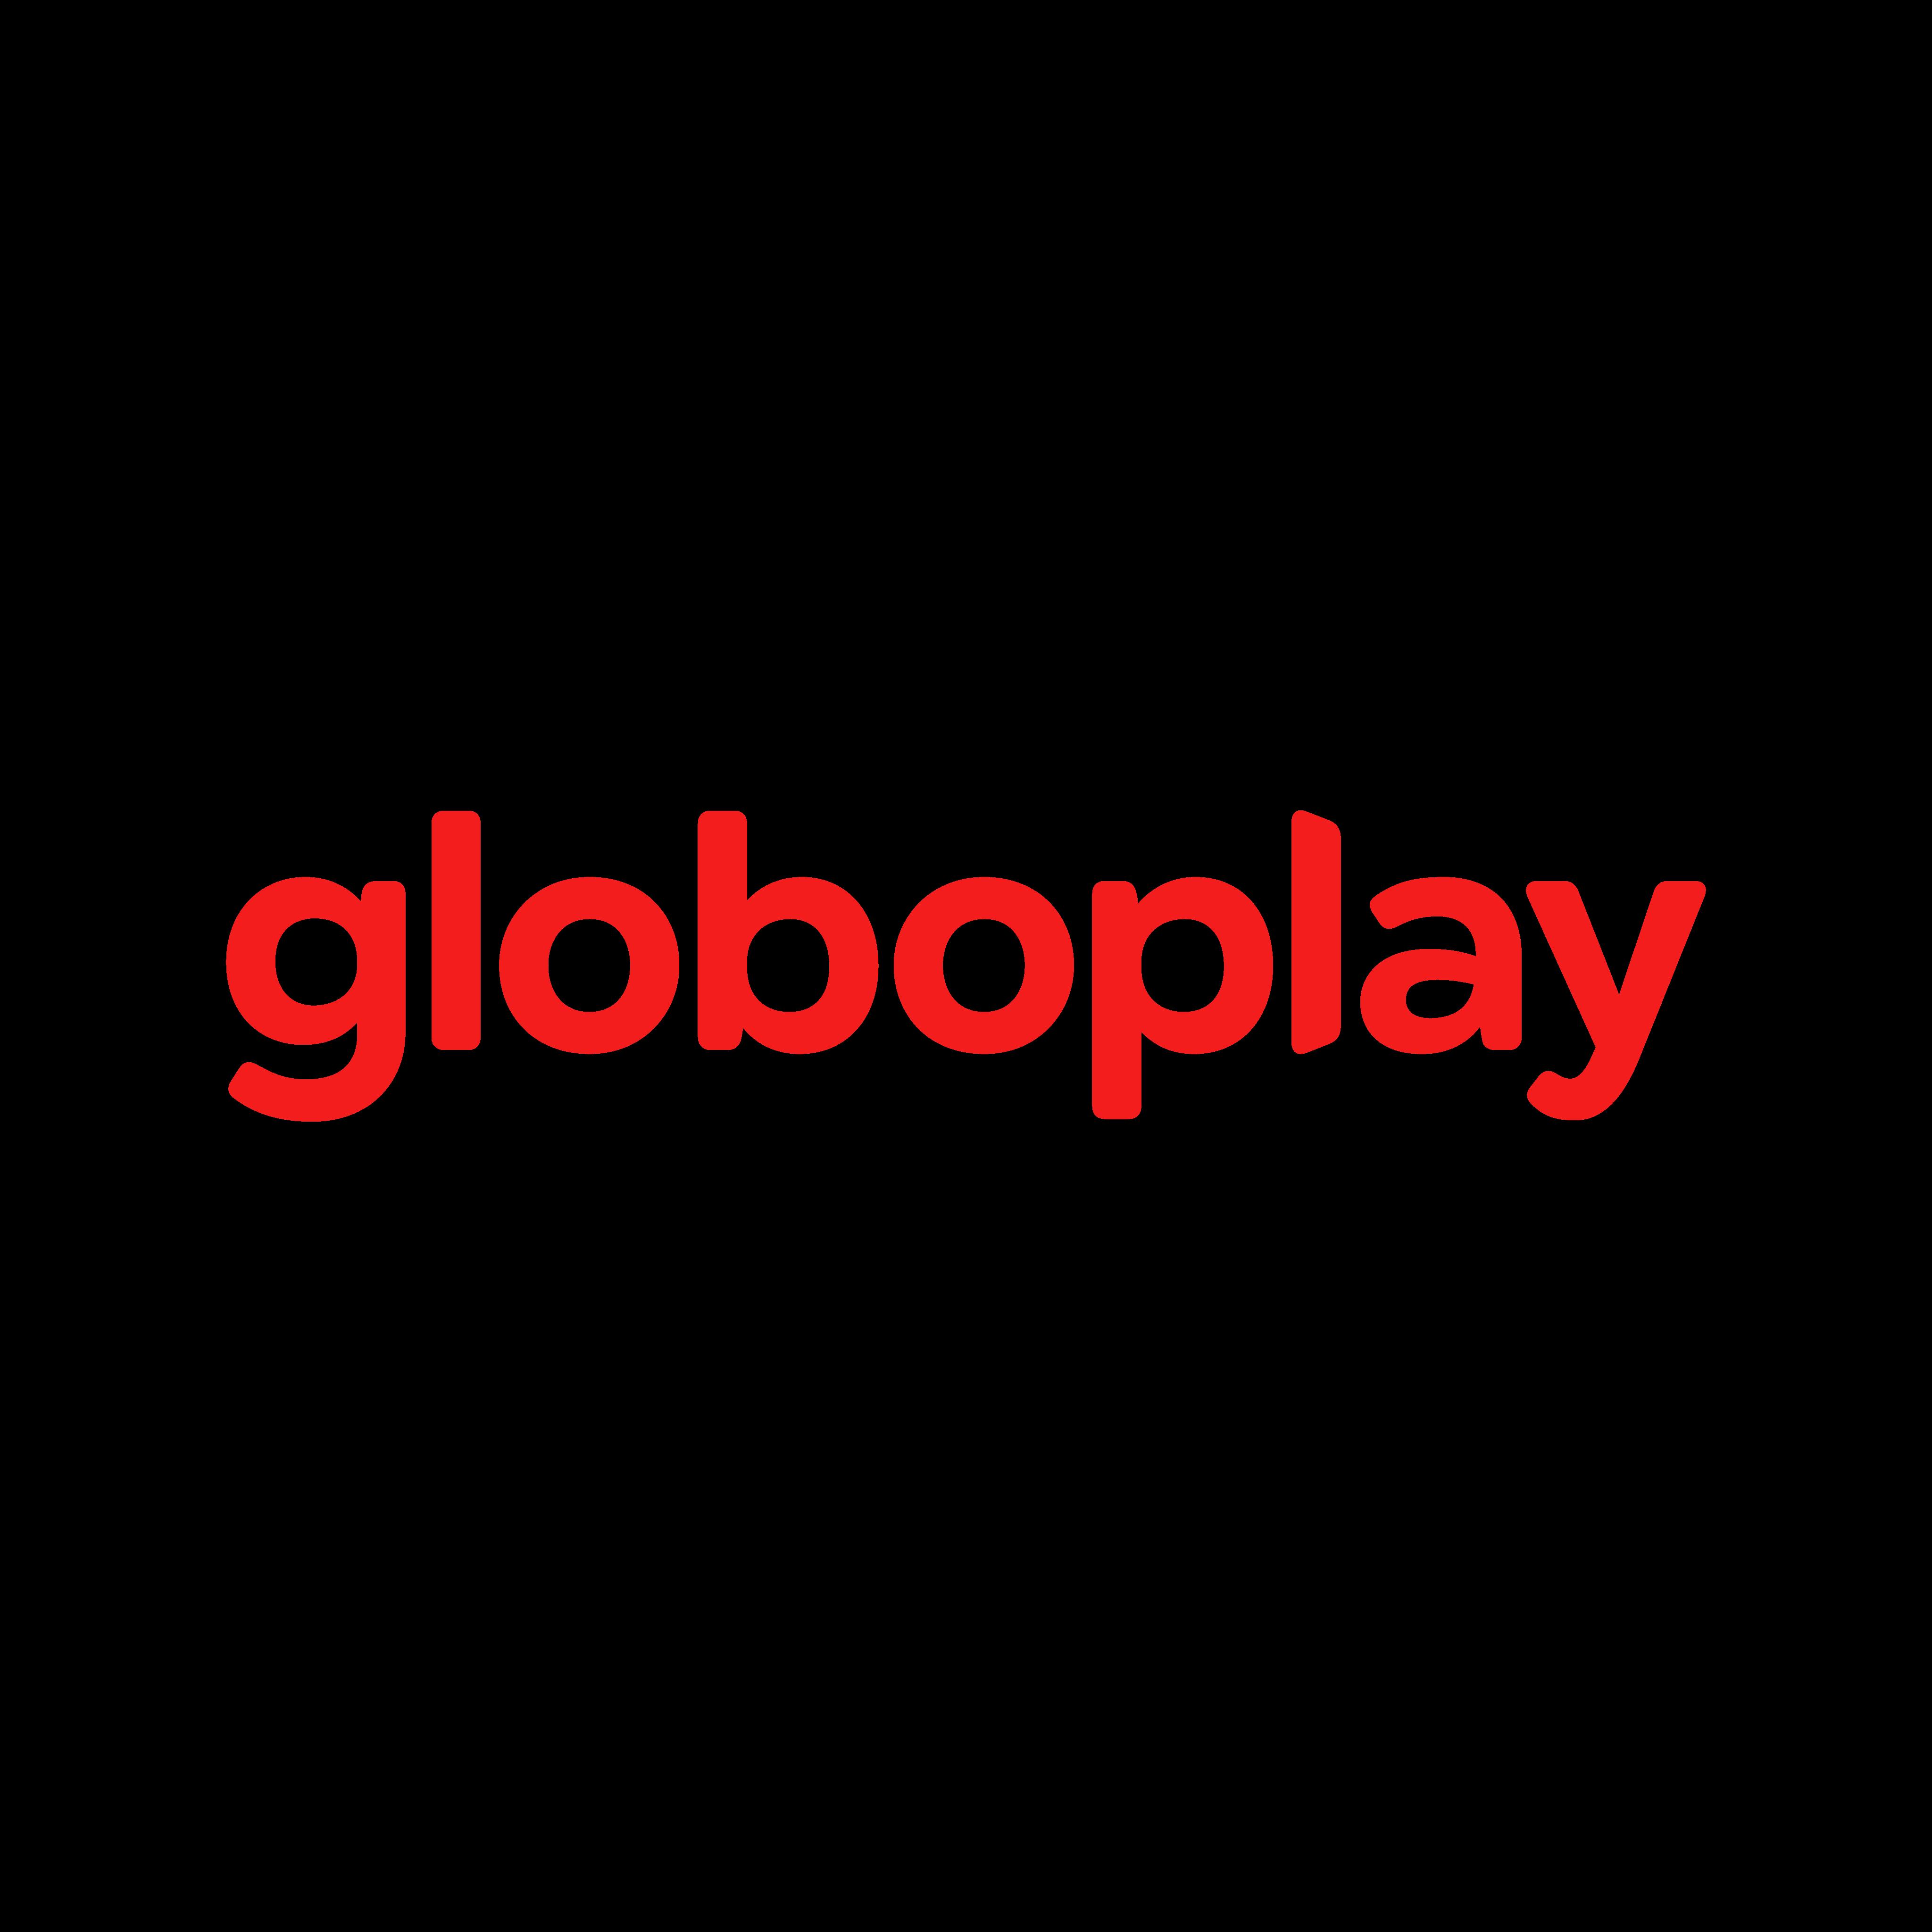 globoplay logo 0 - Globoplay Logo